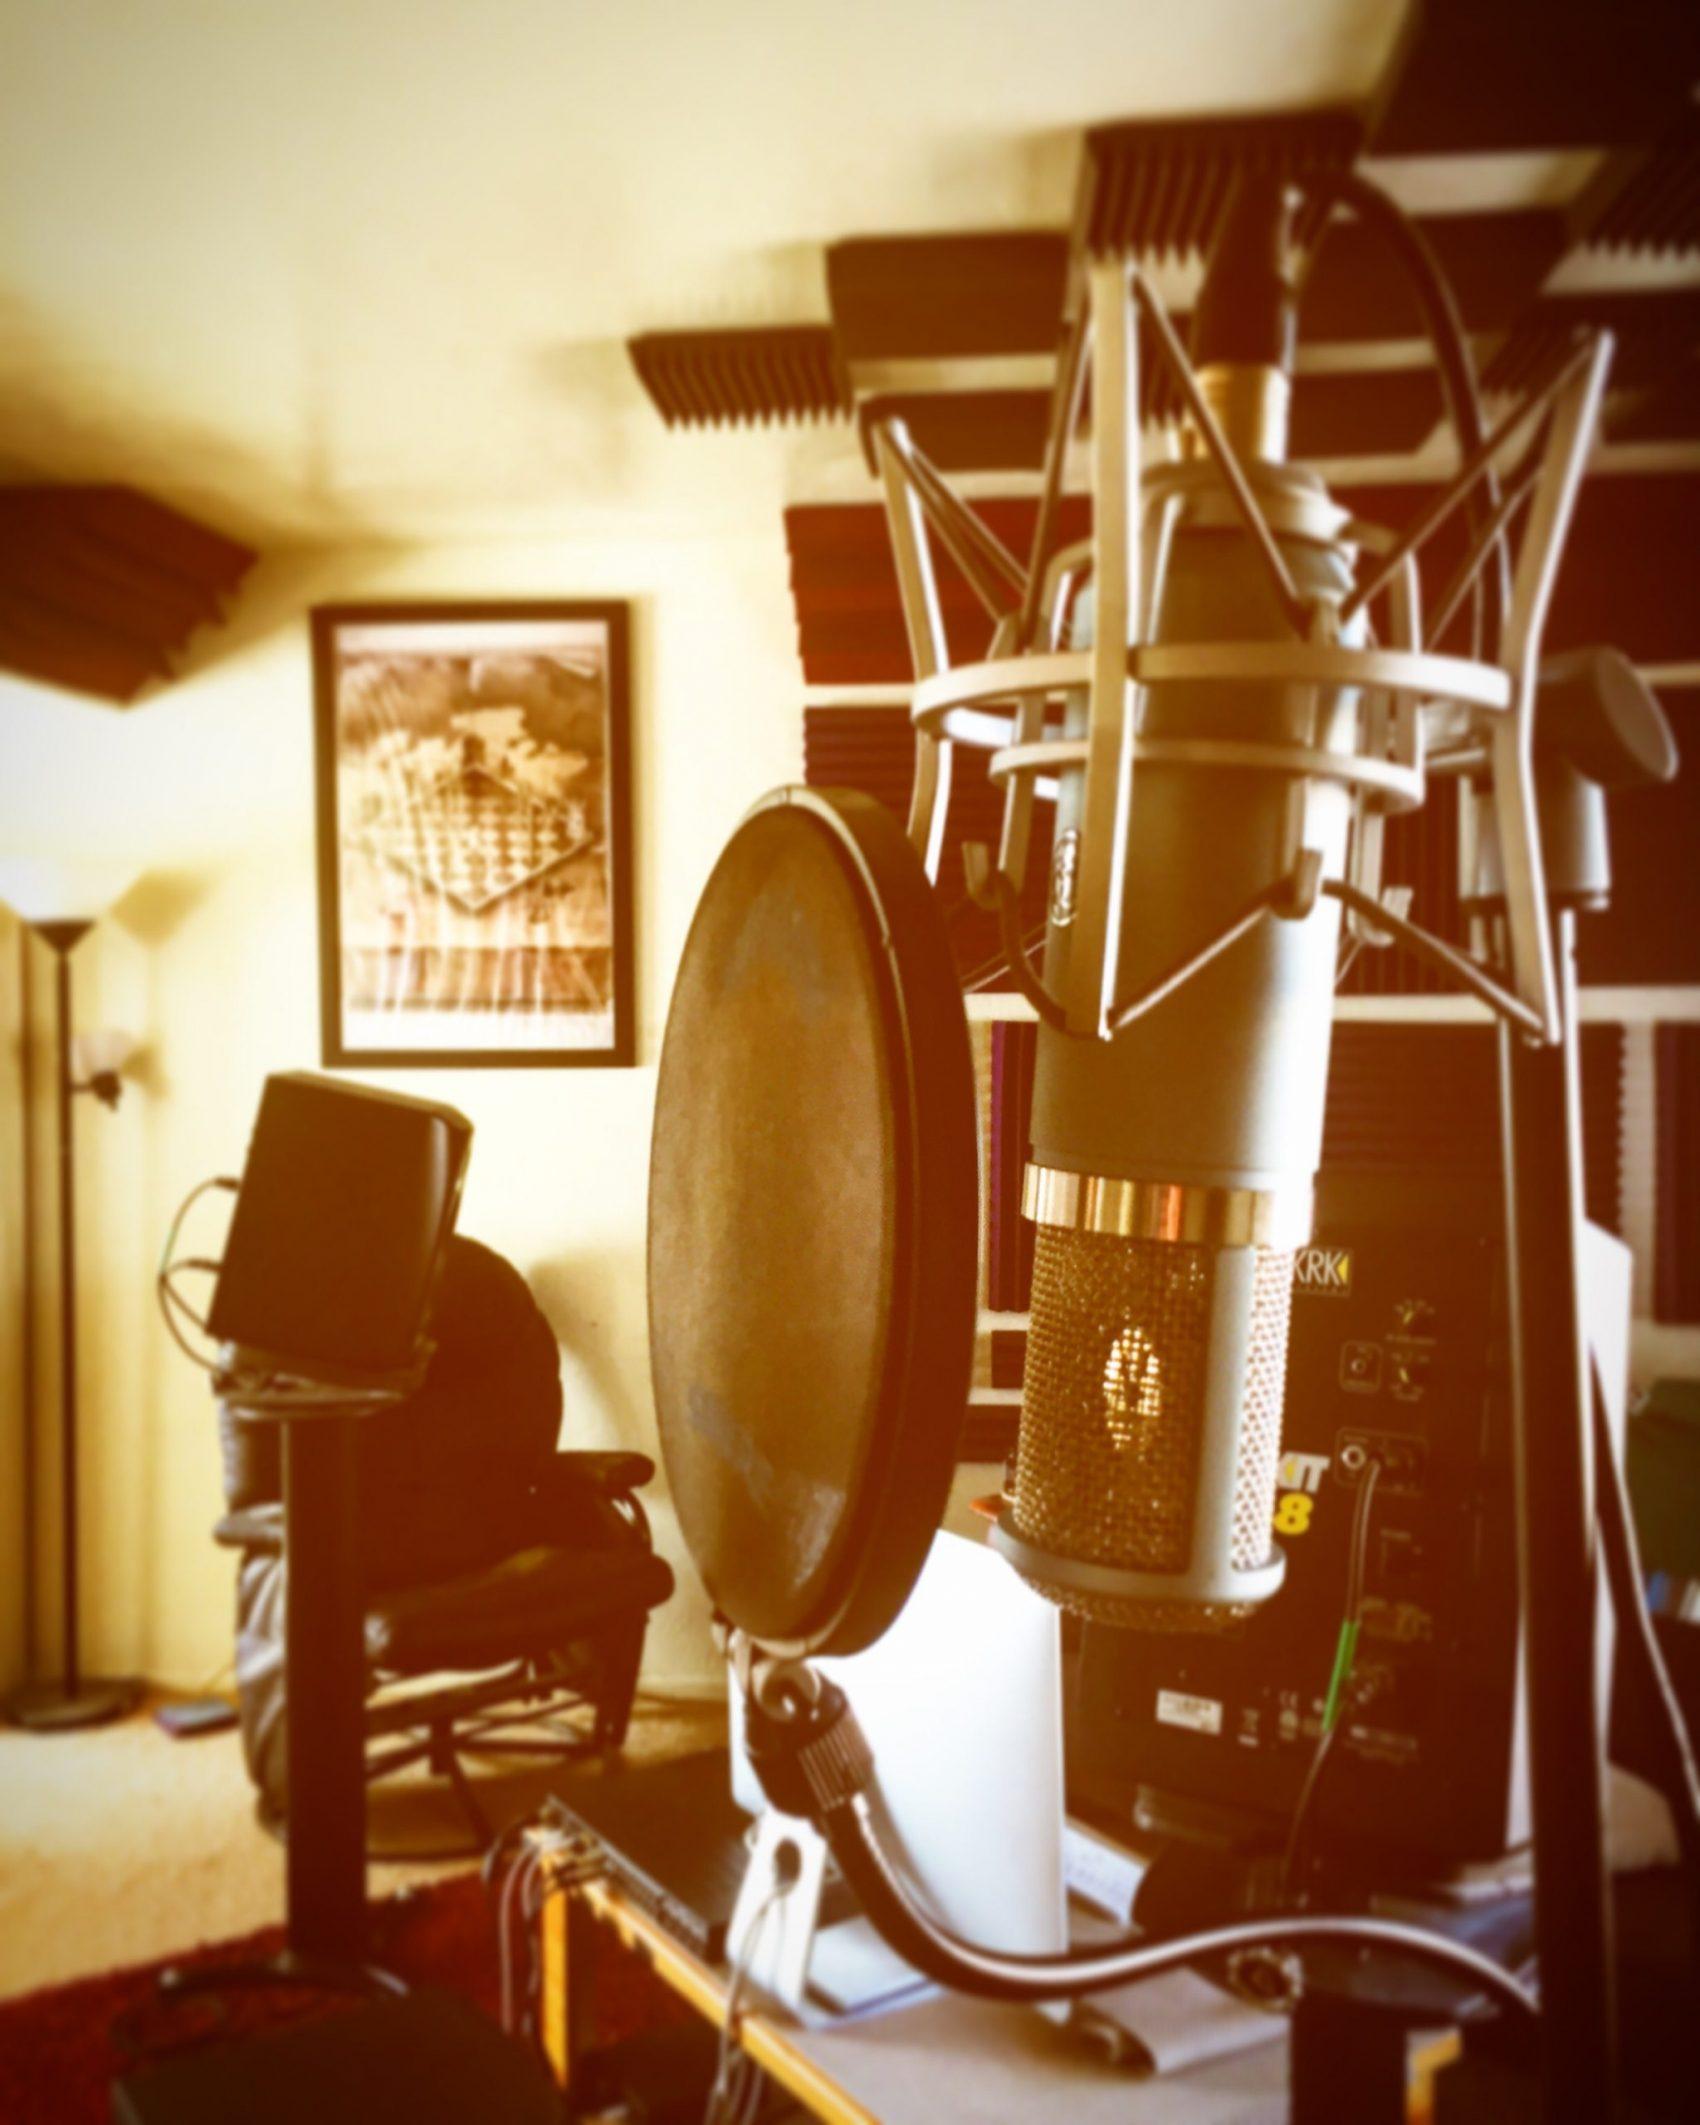 AKG Perception 820 Tube Microphone at TwoCat Studios in Tucson